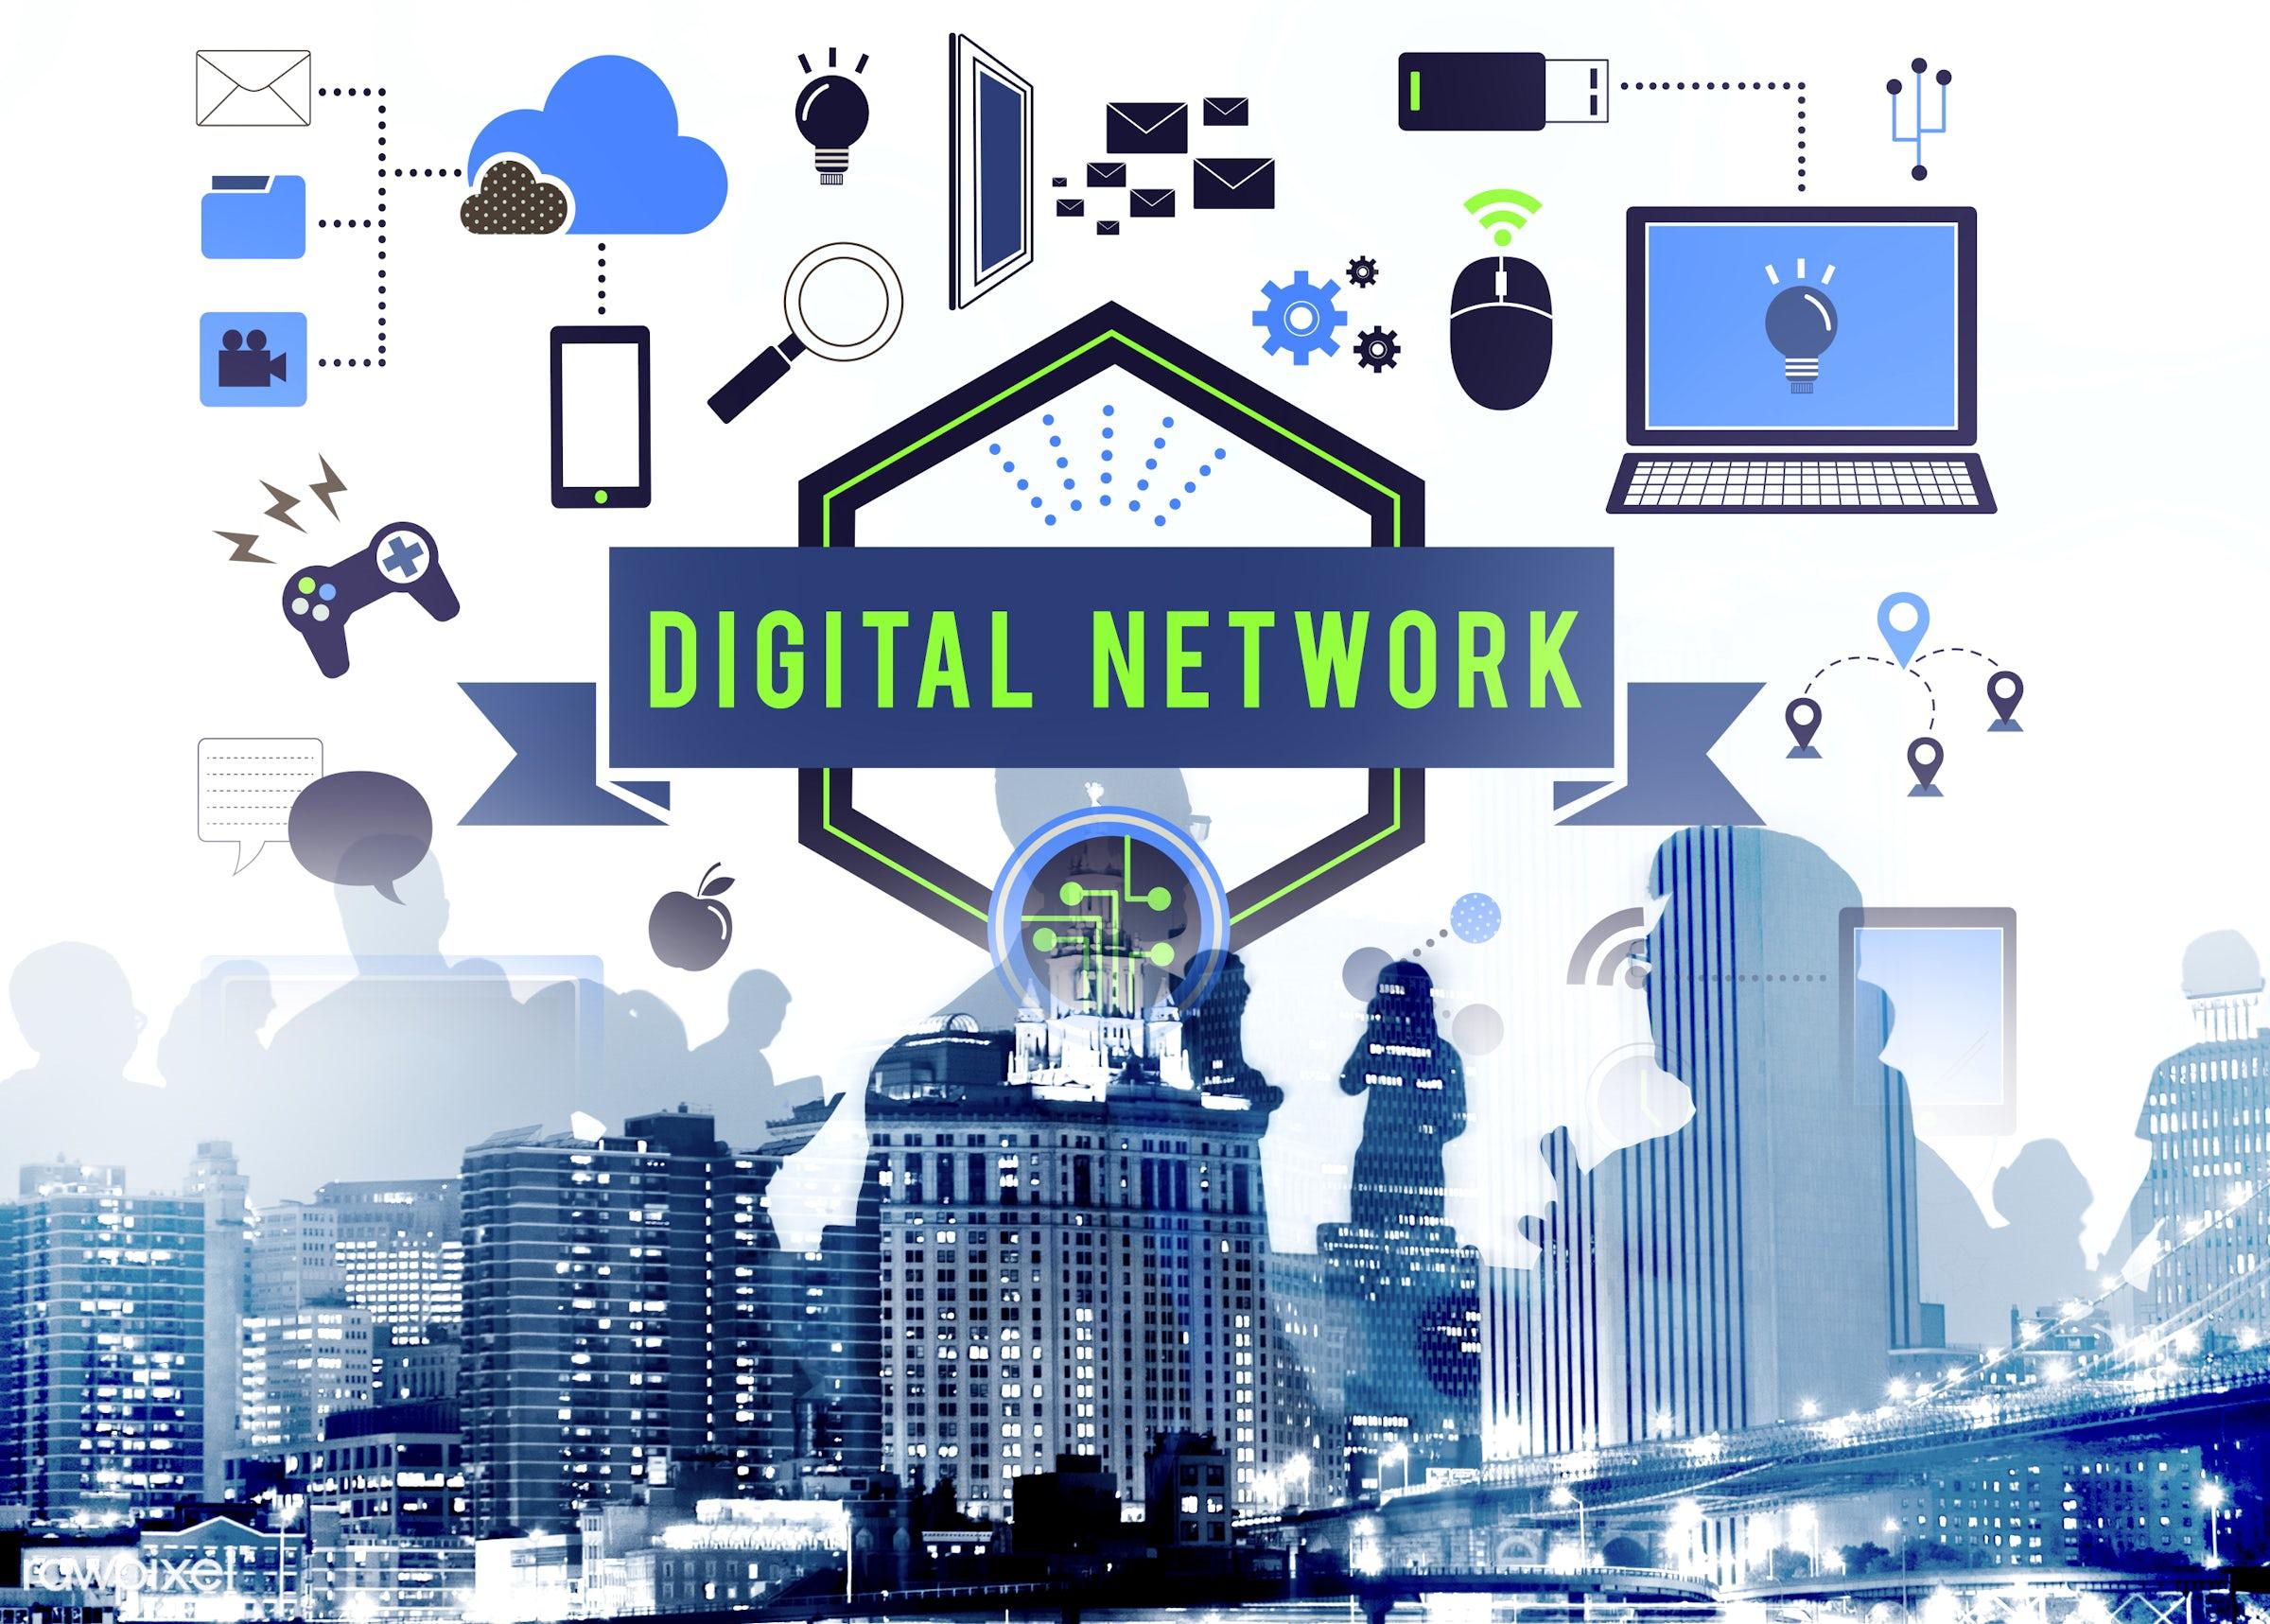 server, digital, internet, abstract, back lit, brainstorming, building, business, businessmen, businesswomen, city,...